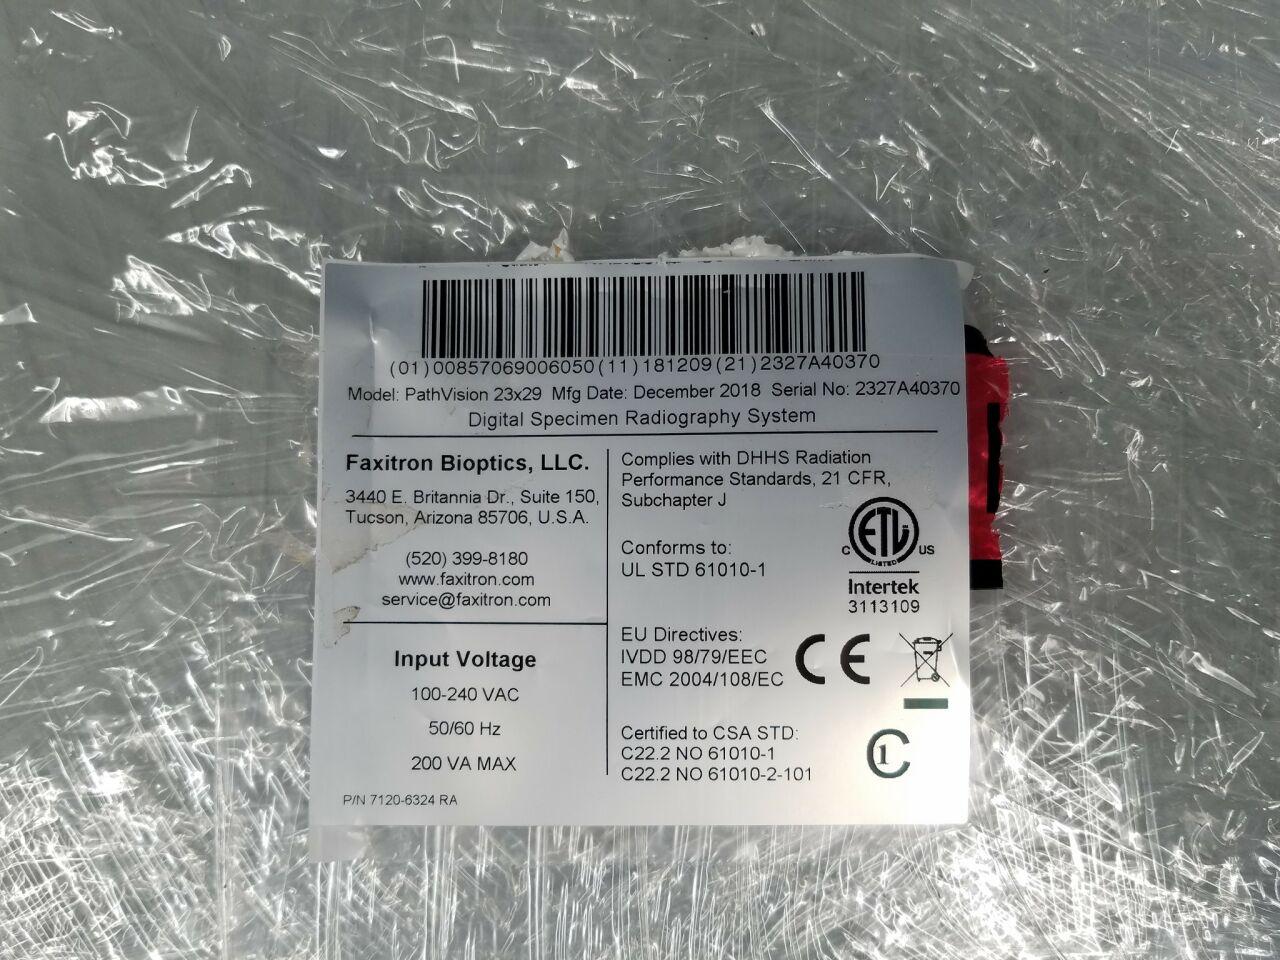 FAXITRON BIOPTICS PathVision 23 x 29cm Digital Specimen Radiography System (New)